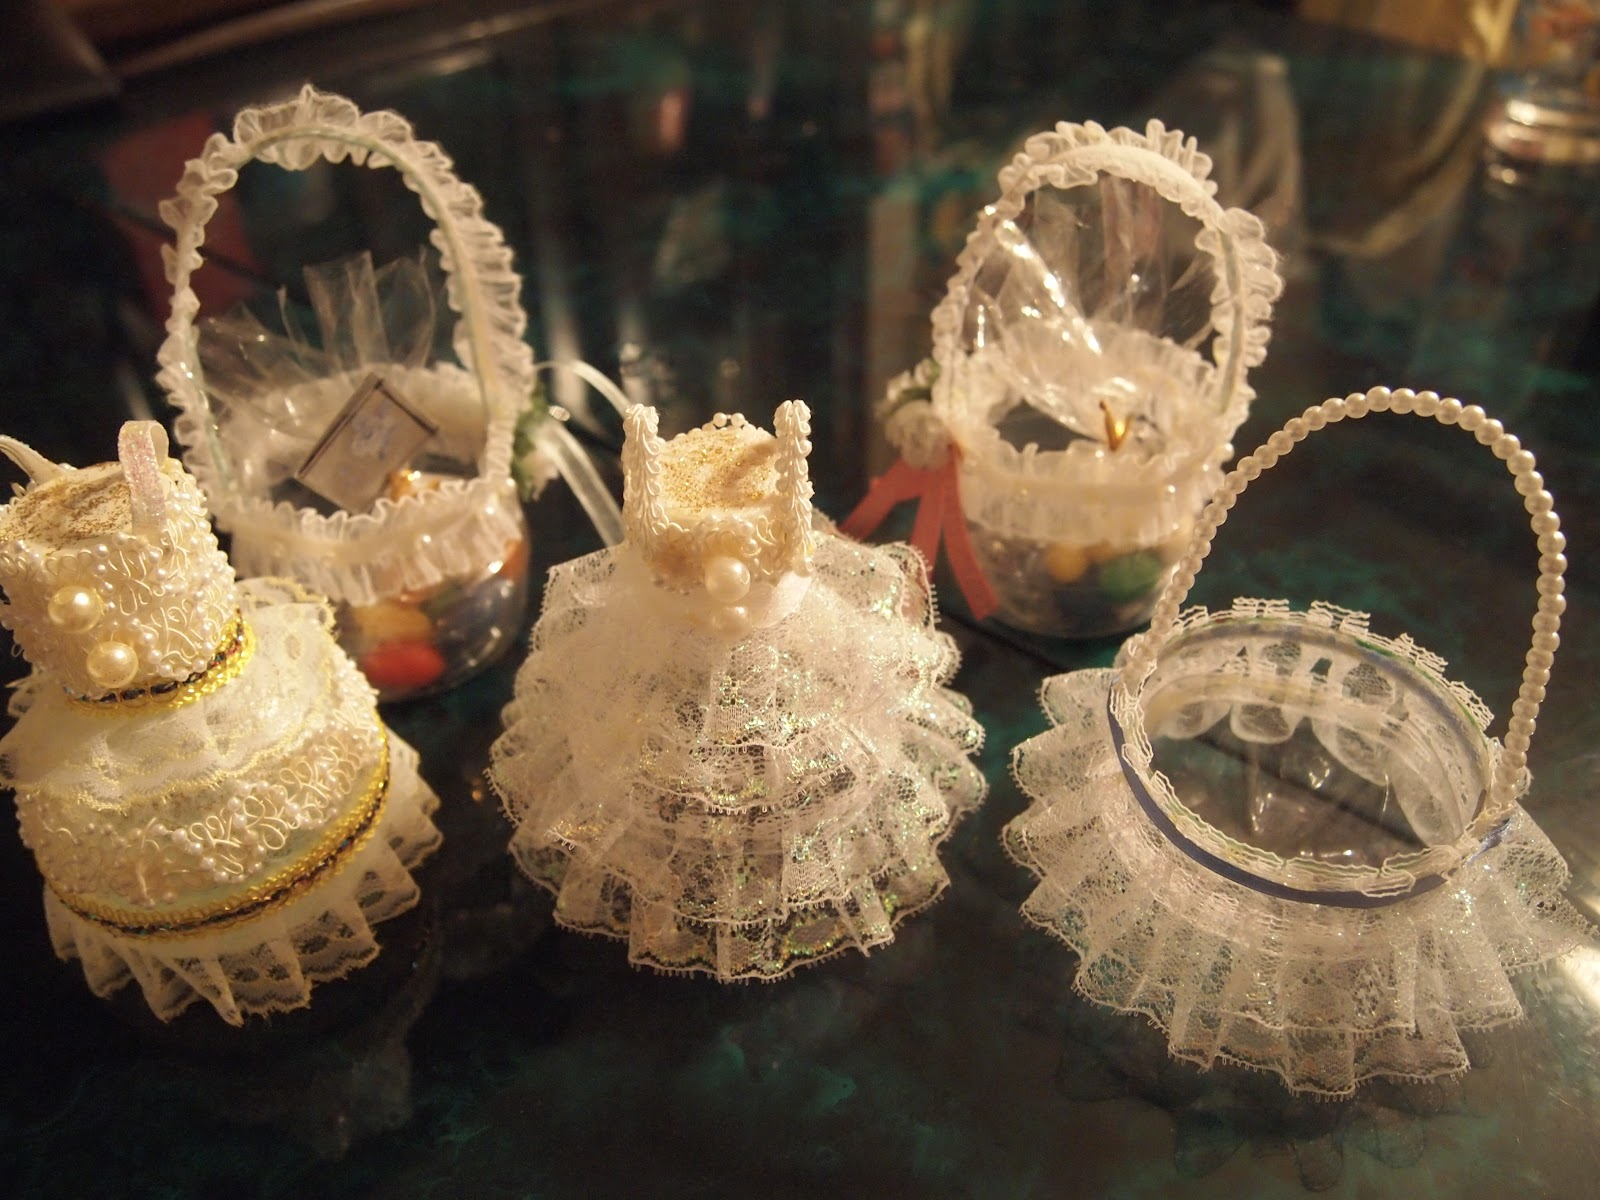 Creative Diy Wedding Gifts: Ysahs Creative Hobby: D.I.Y. Creative Ideas For Wedding Favors